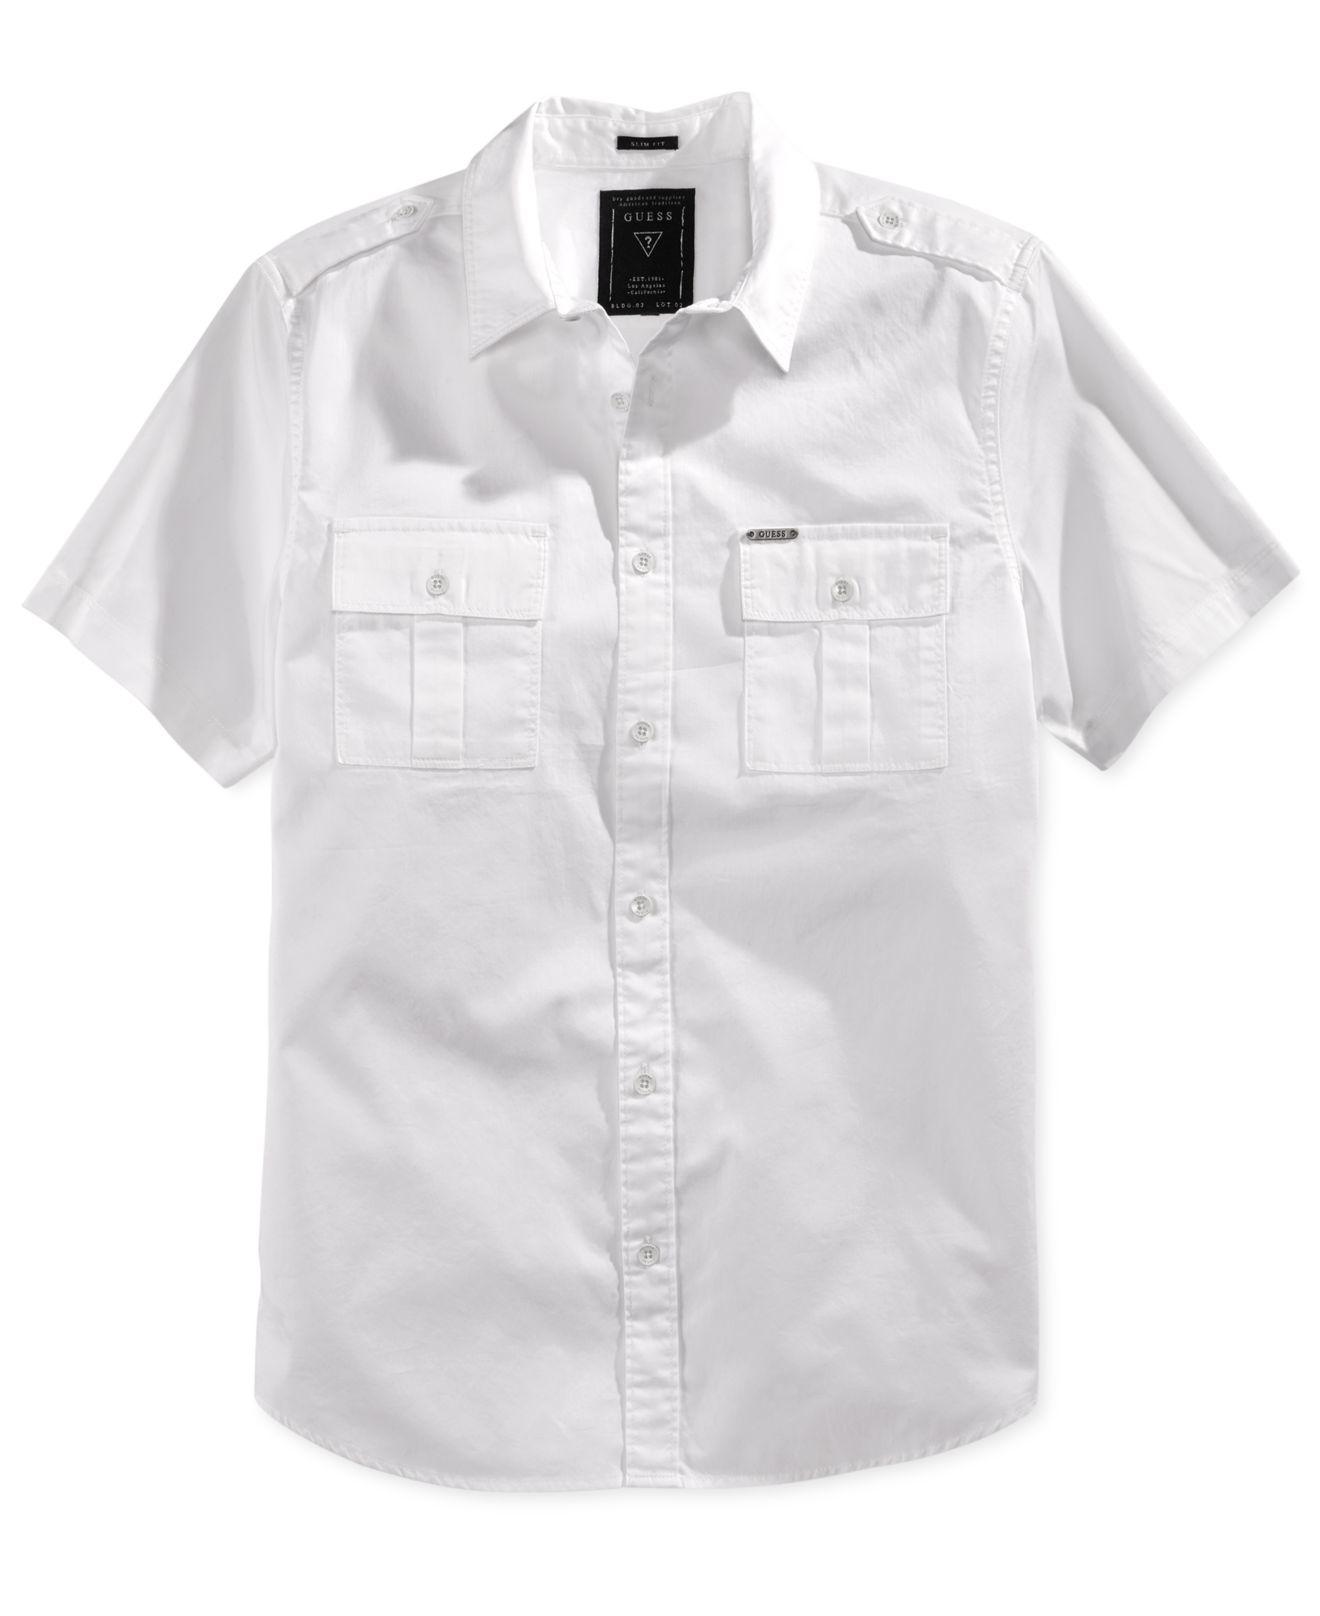 6187d896727 Amazon Uk Mens Short Sleeve Shirts